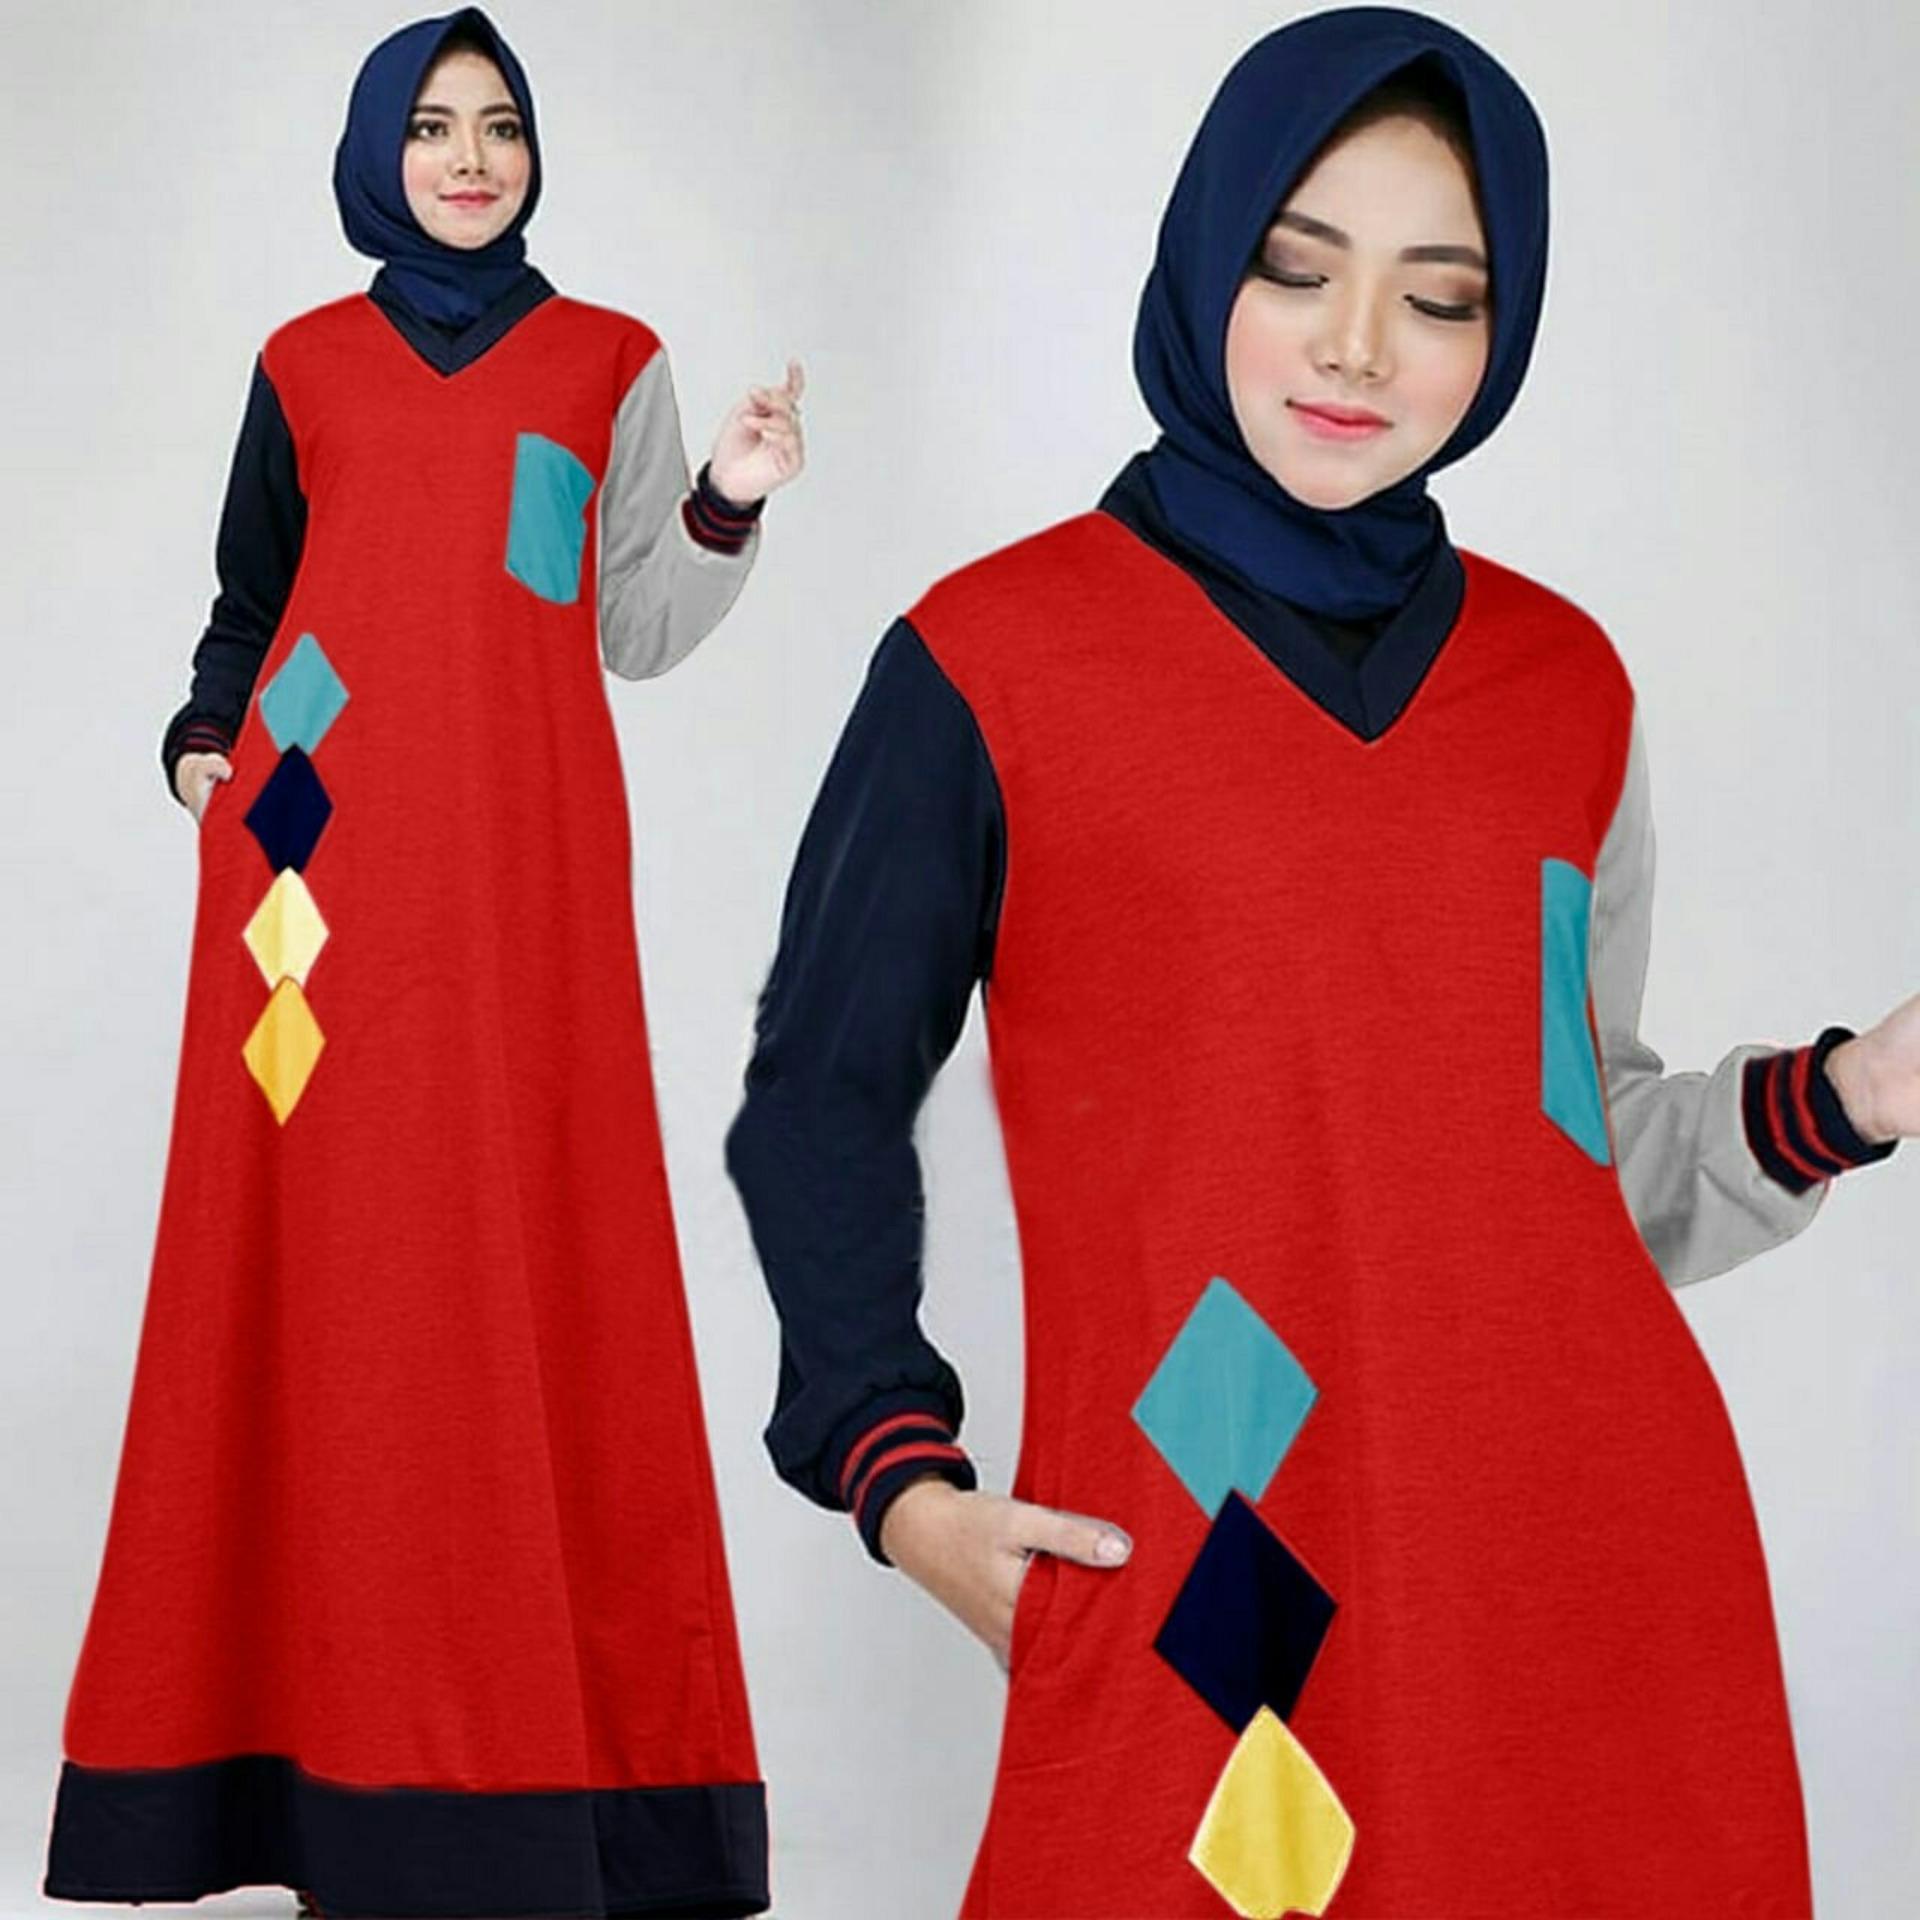 LEMONE Cullote Pants / Celana Kulot Wanita - Krem. Source · Anami Store - Pakaian Muslimah Wanita Fashionable - Maxy Axel